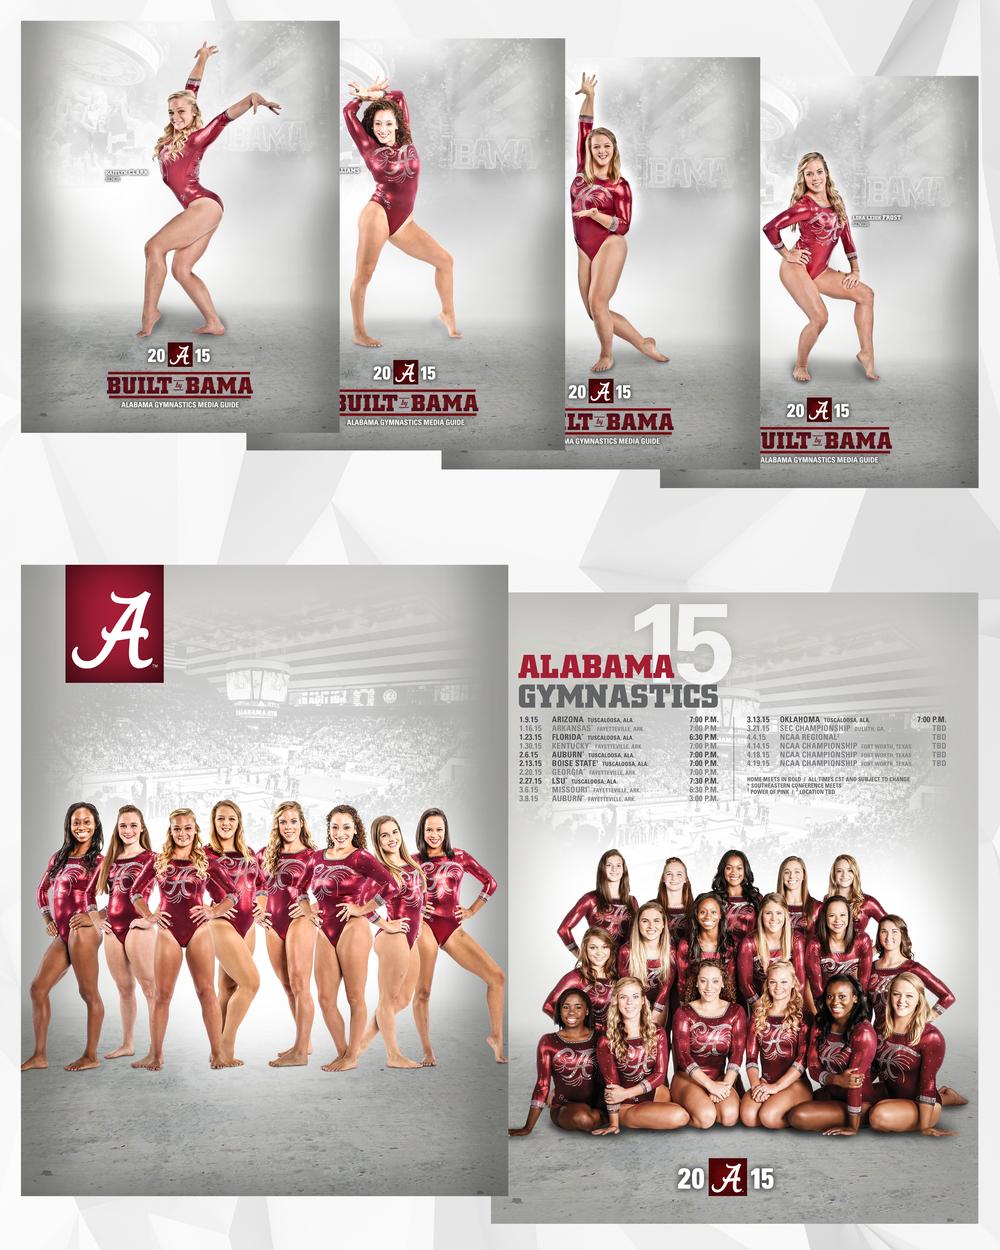 Alabama_page3.jpg